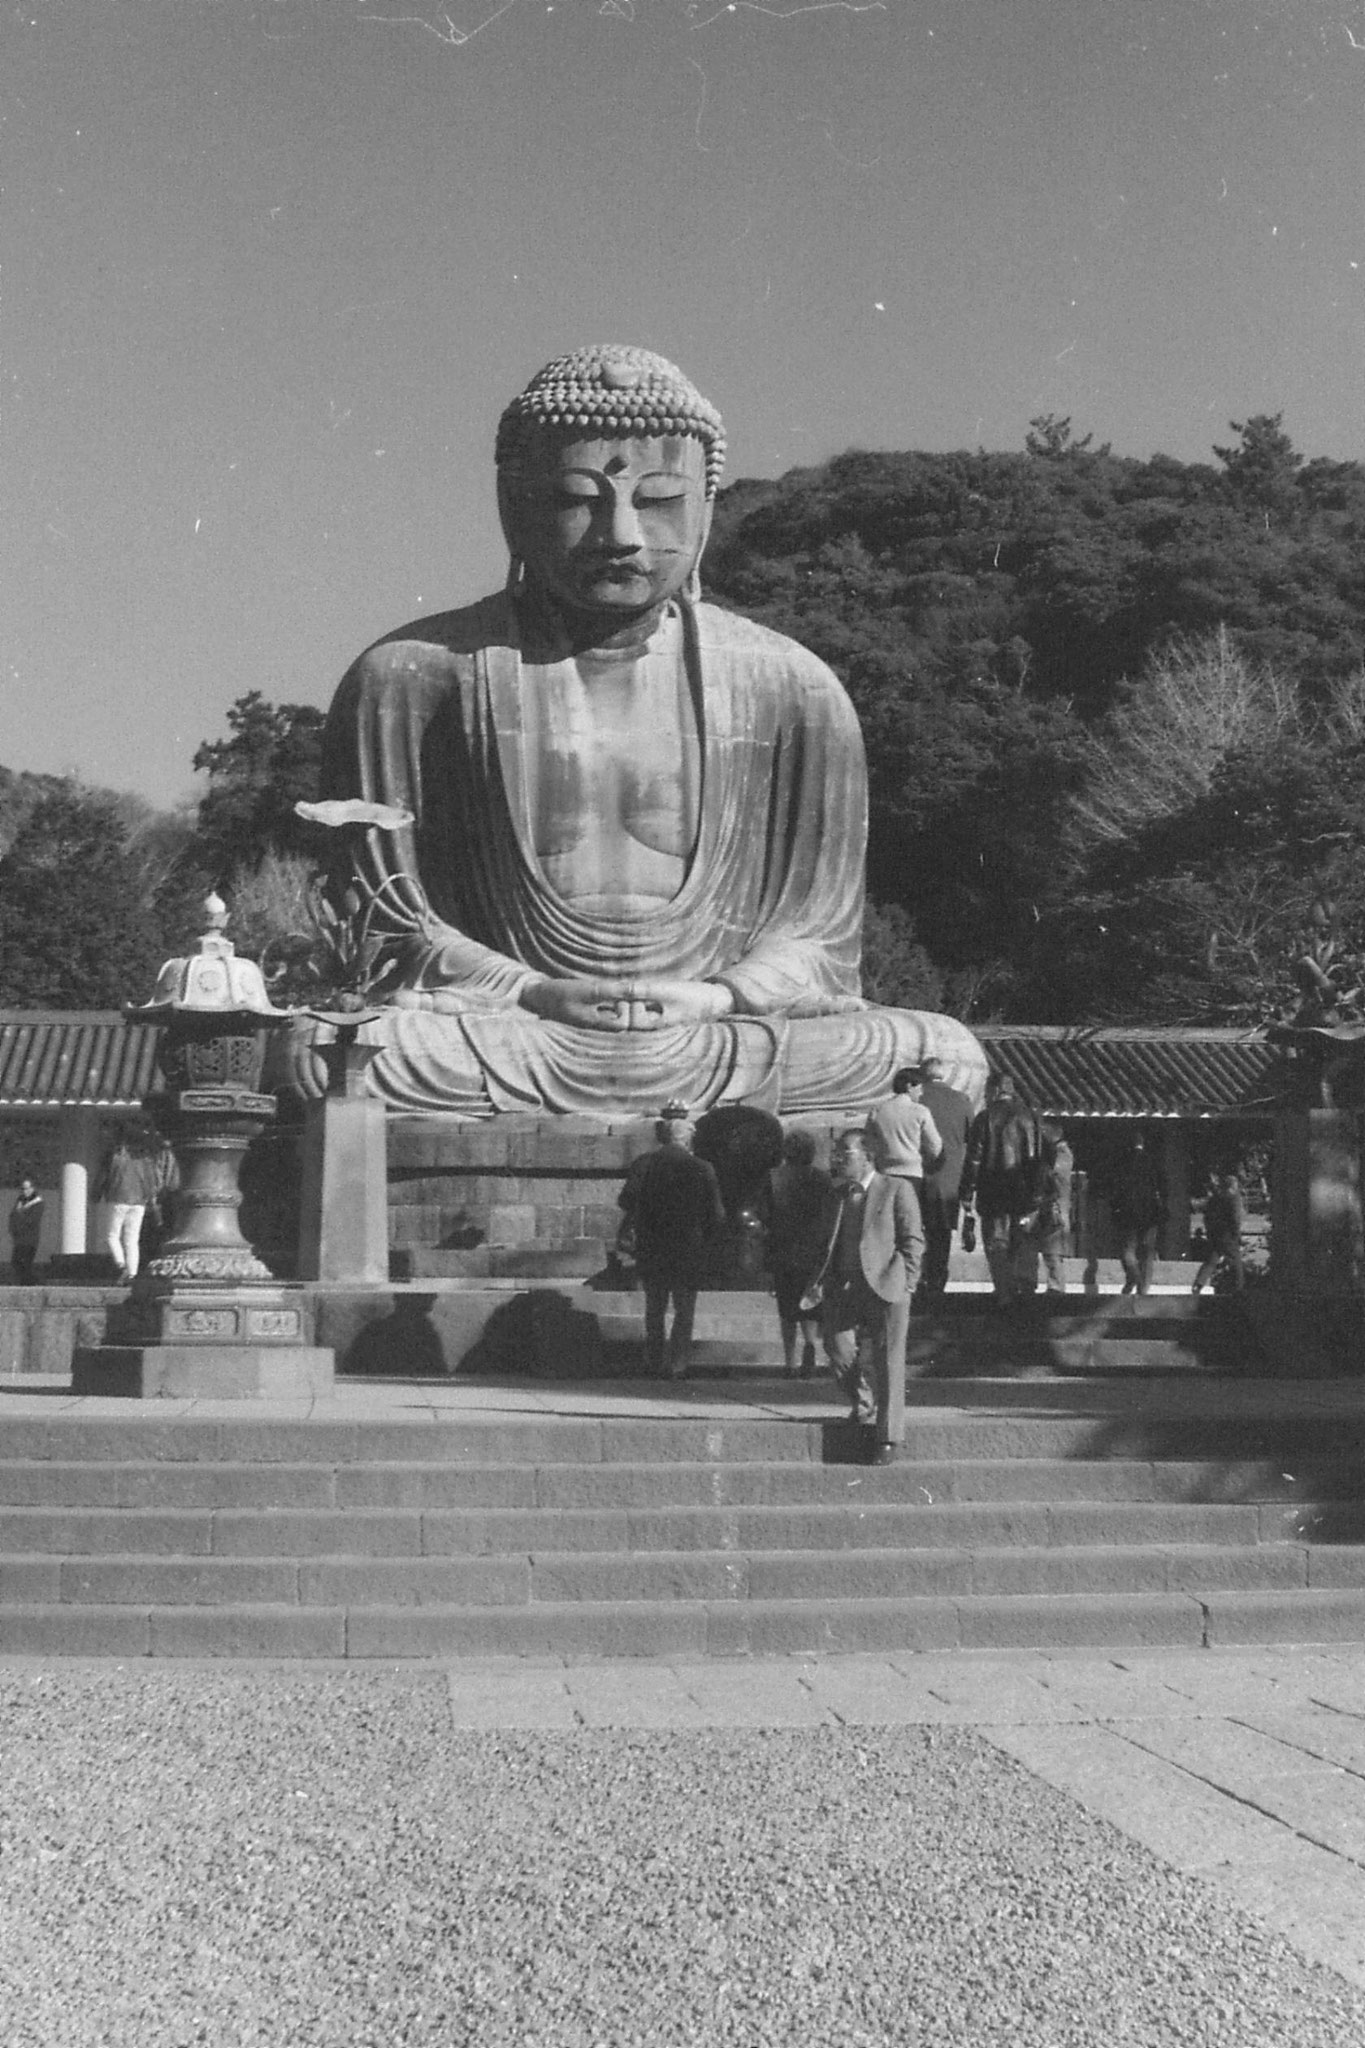 29/1/1989: 29:Daibutsu at Kamakura